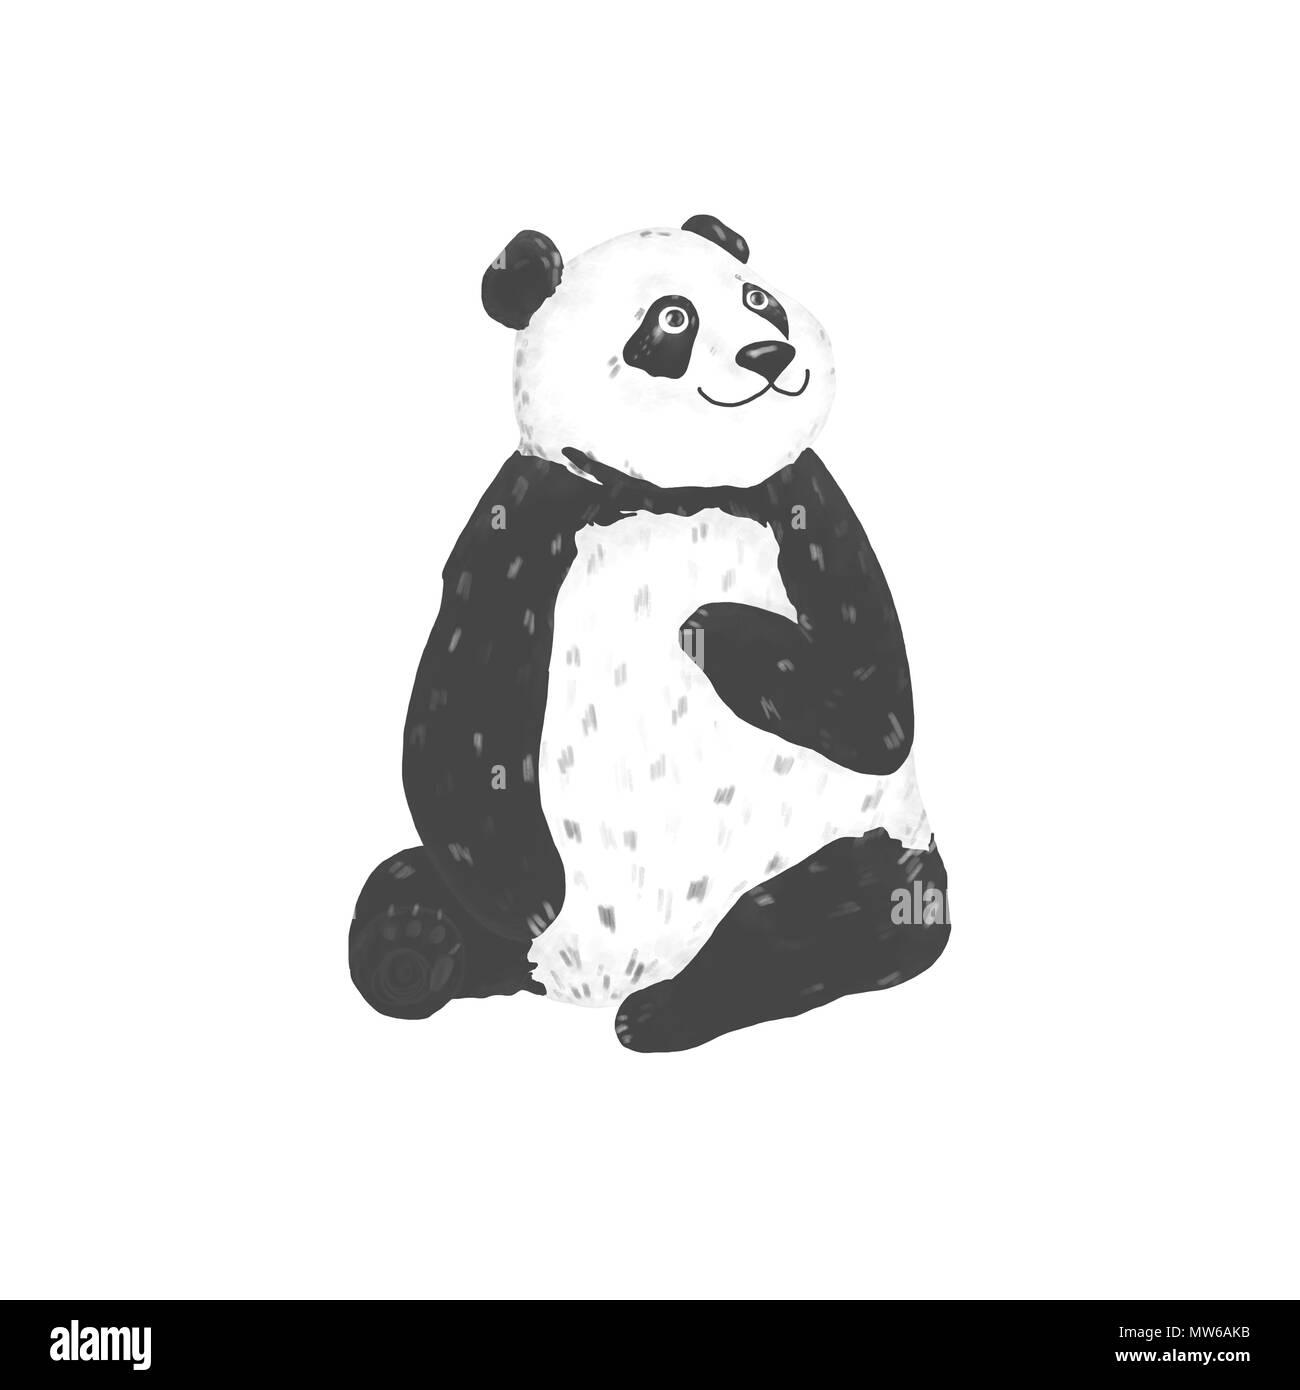 C8alamycomcompfrmw6akbclip Art Panda Animal C